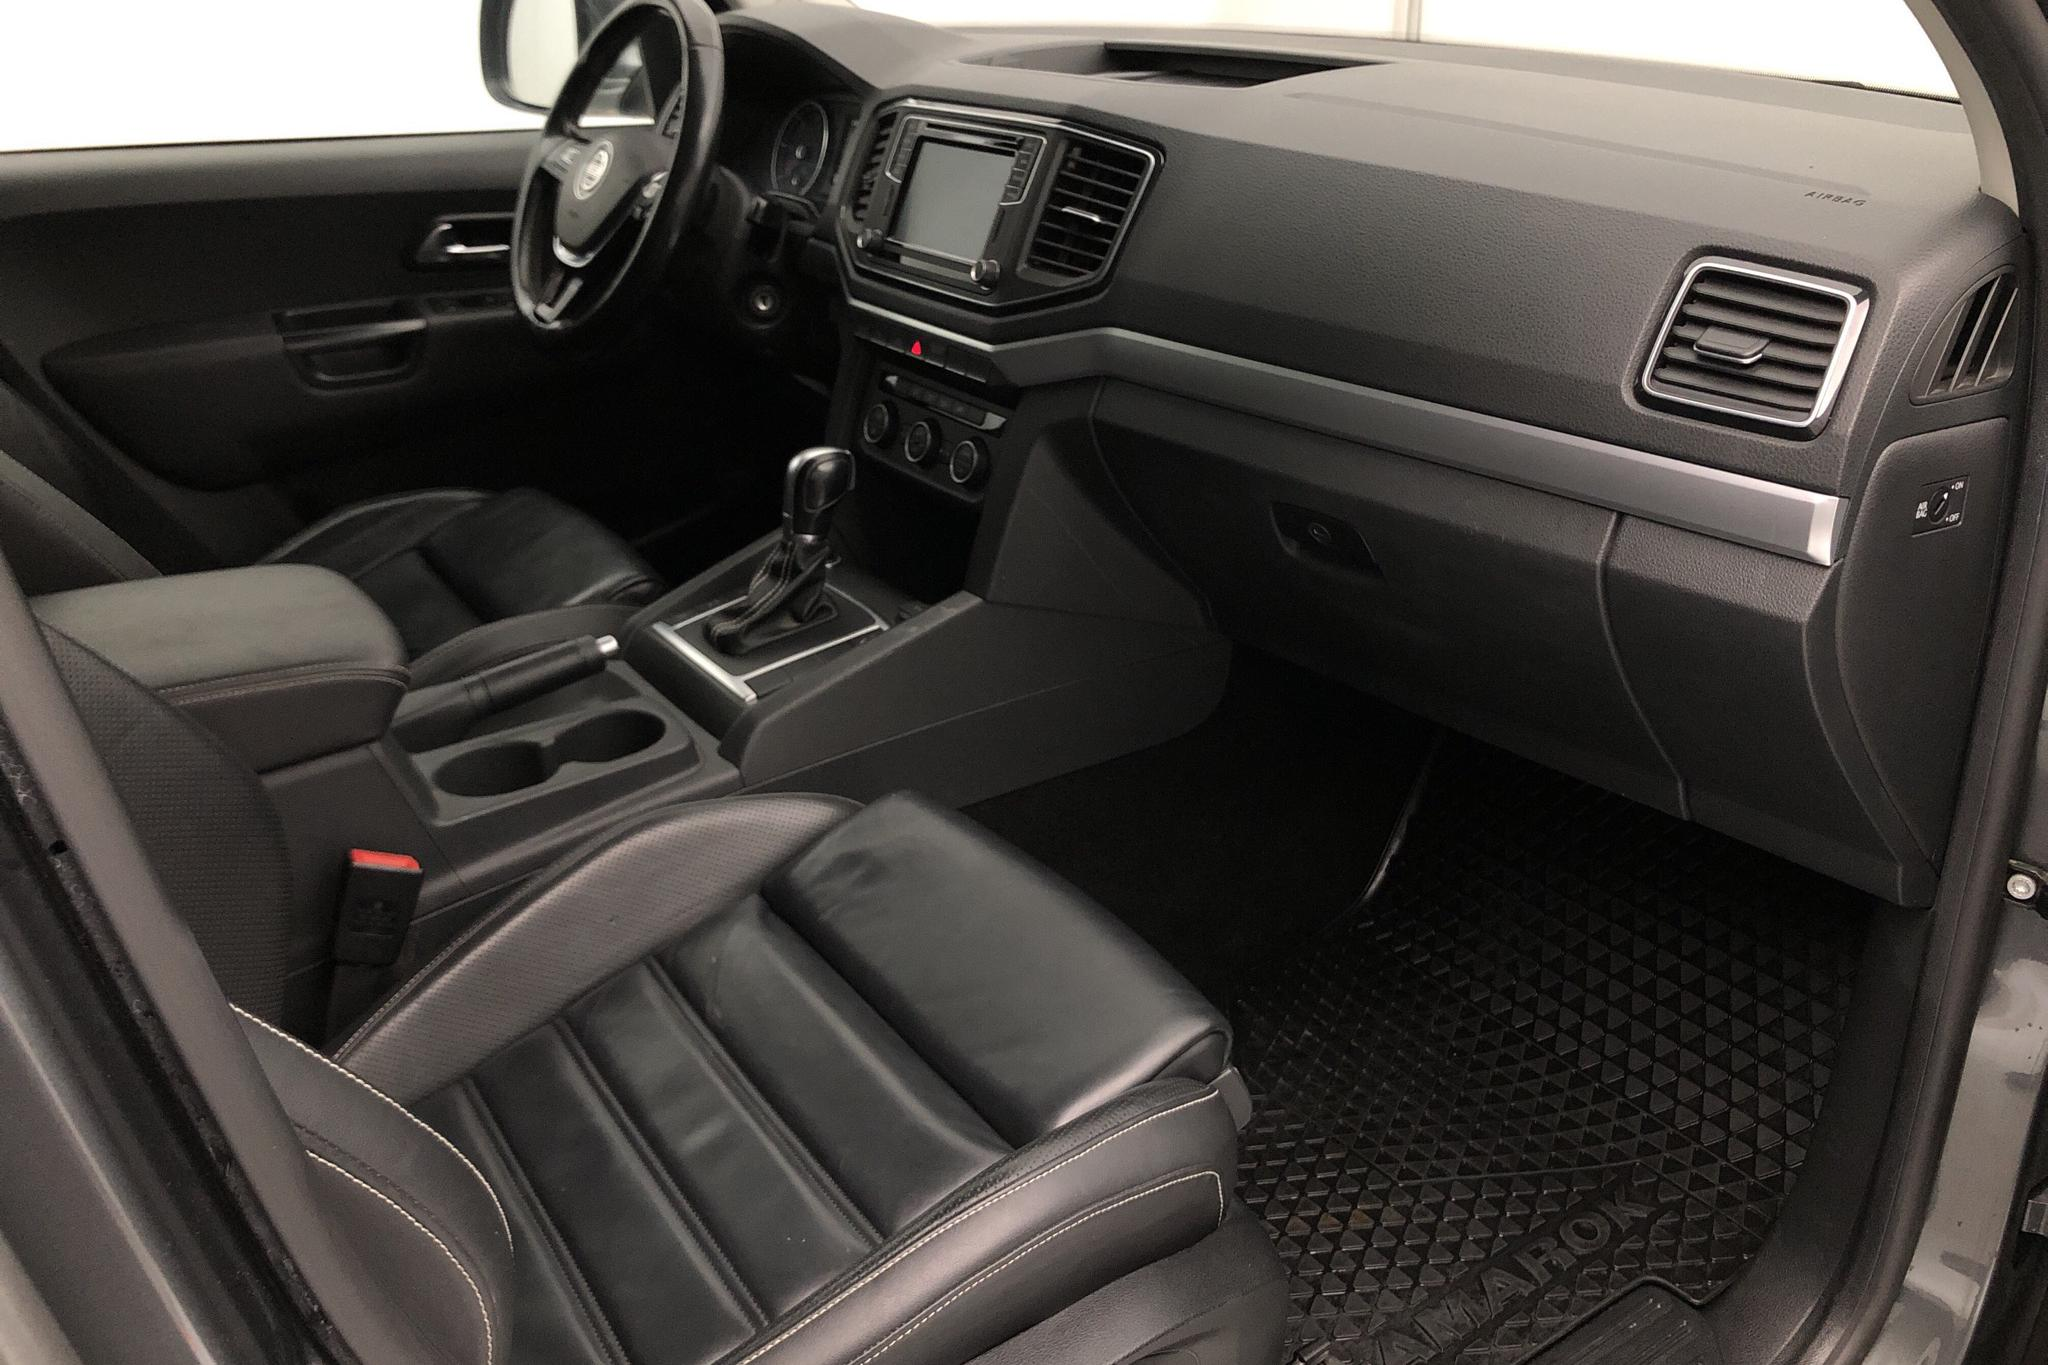 VW Amarok 3.0 TDI 4motion (224hk) - 80 680 km - Automatic - gray - 2017